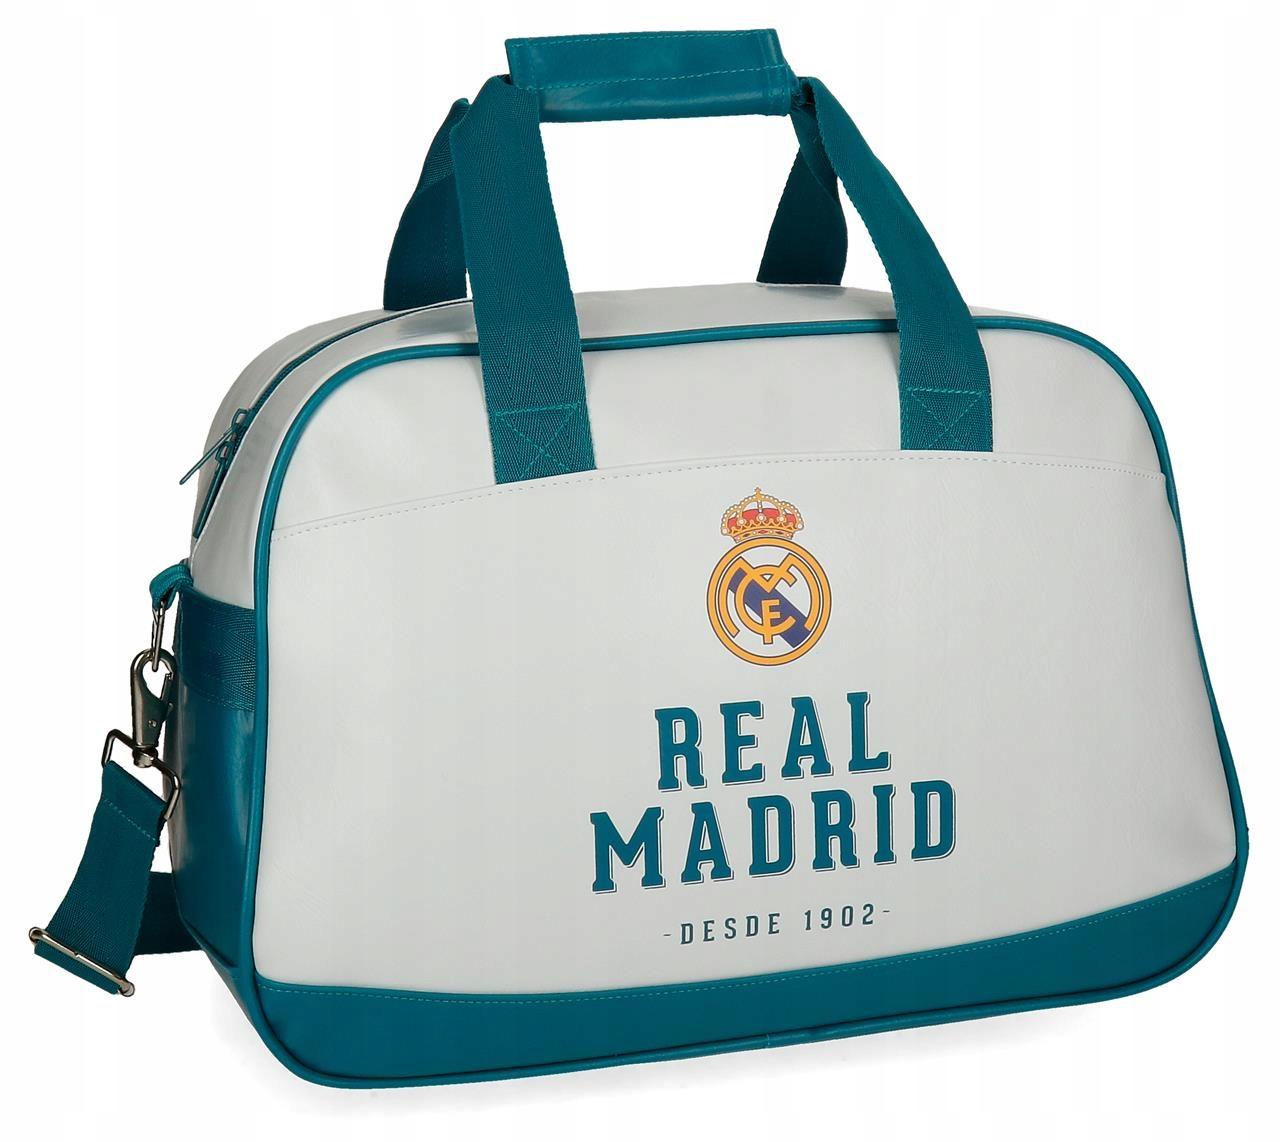 873e498702c18 Joumma Bags Torba podróżna Real Madryt - 7674034559 - oficjalne ...